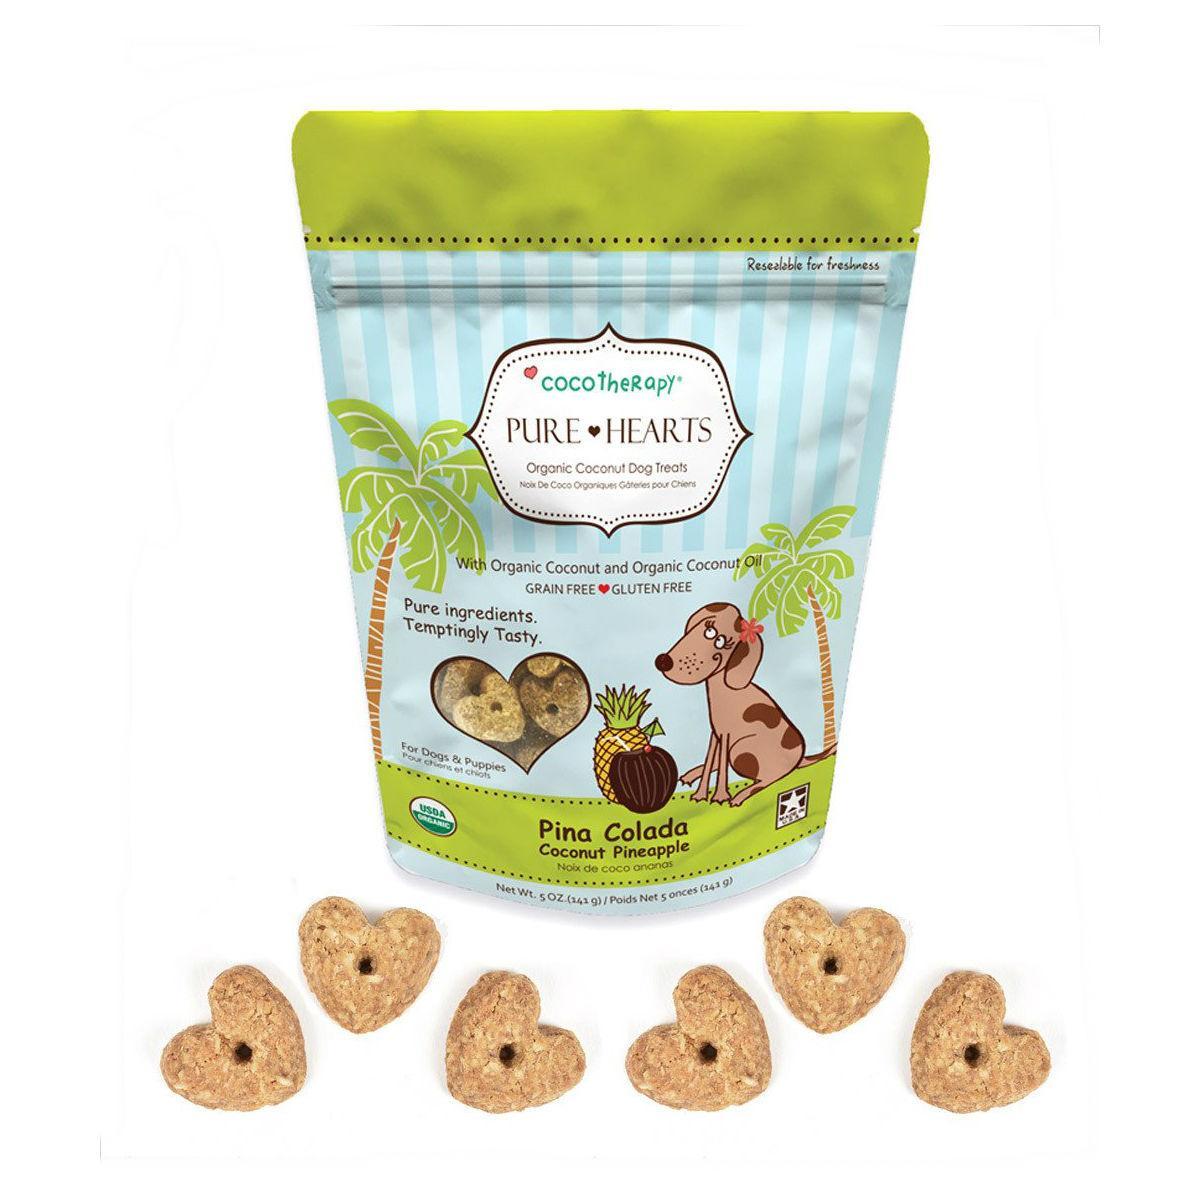 CocoTherapy Pure Hearts Organic Dog Treats - Pina Colada